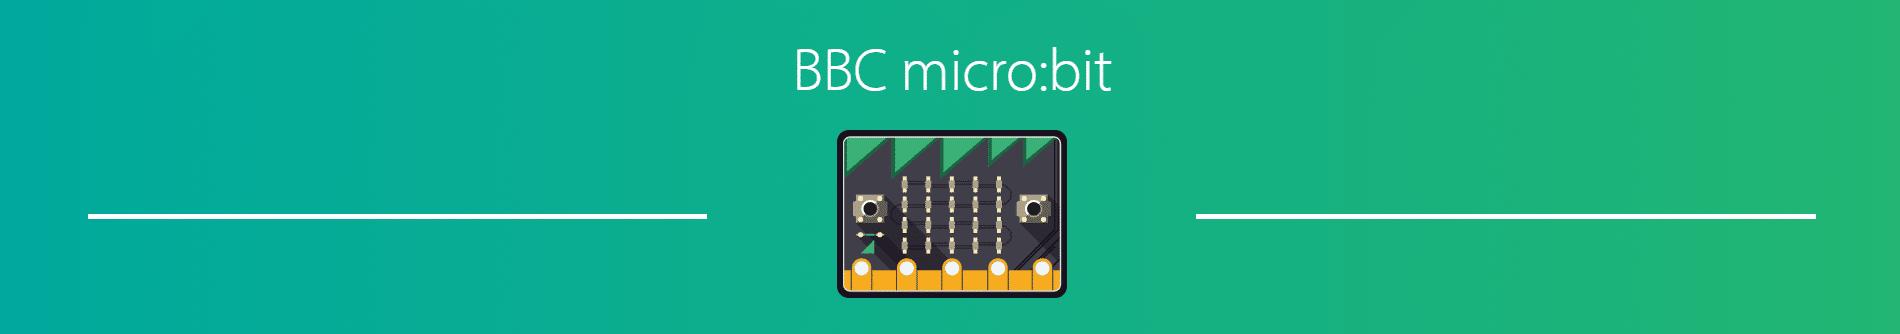 microbit-heading-image